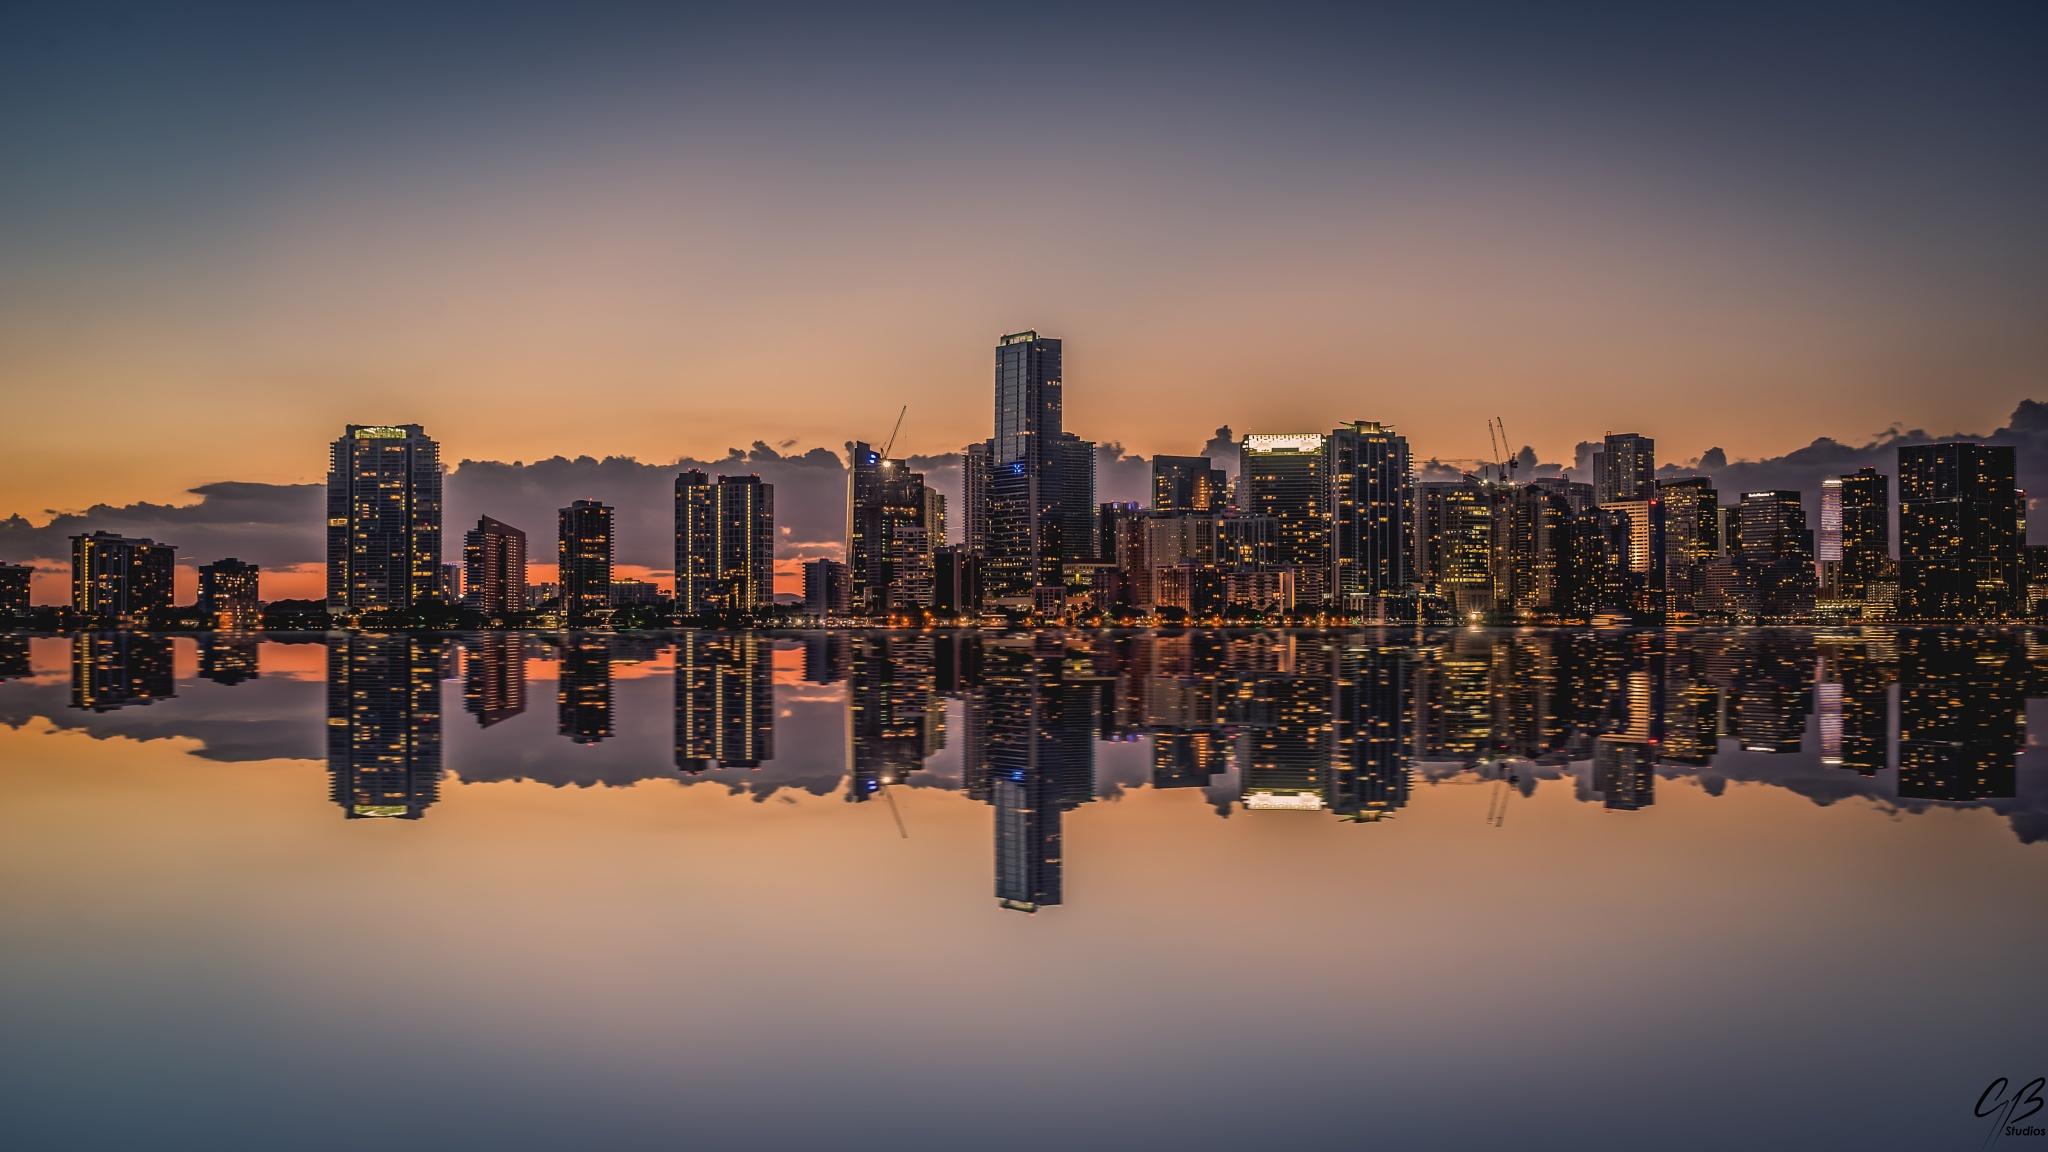 Brickell Miami by Corey B Studios